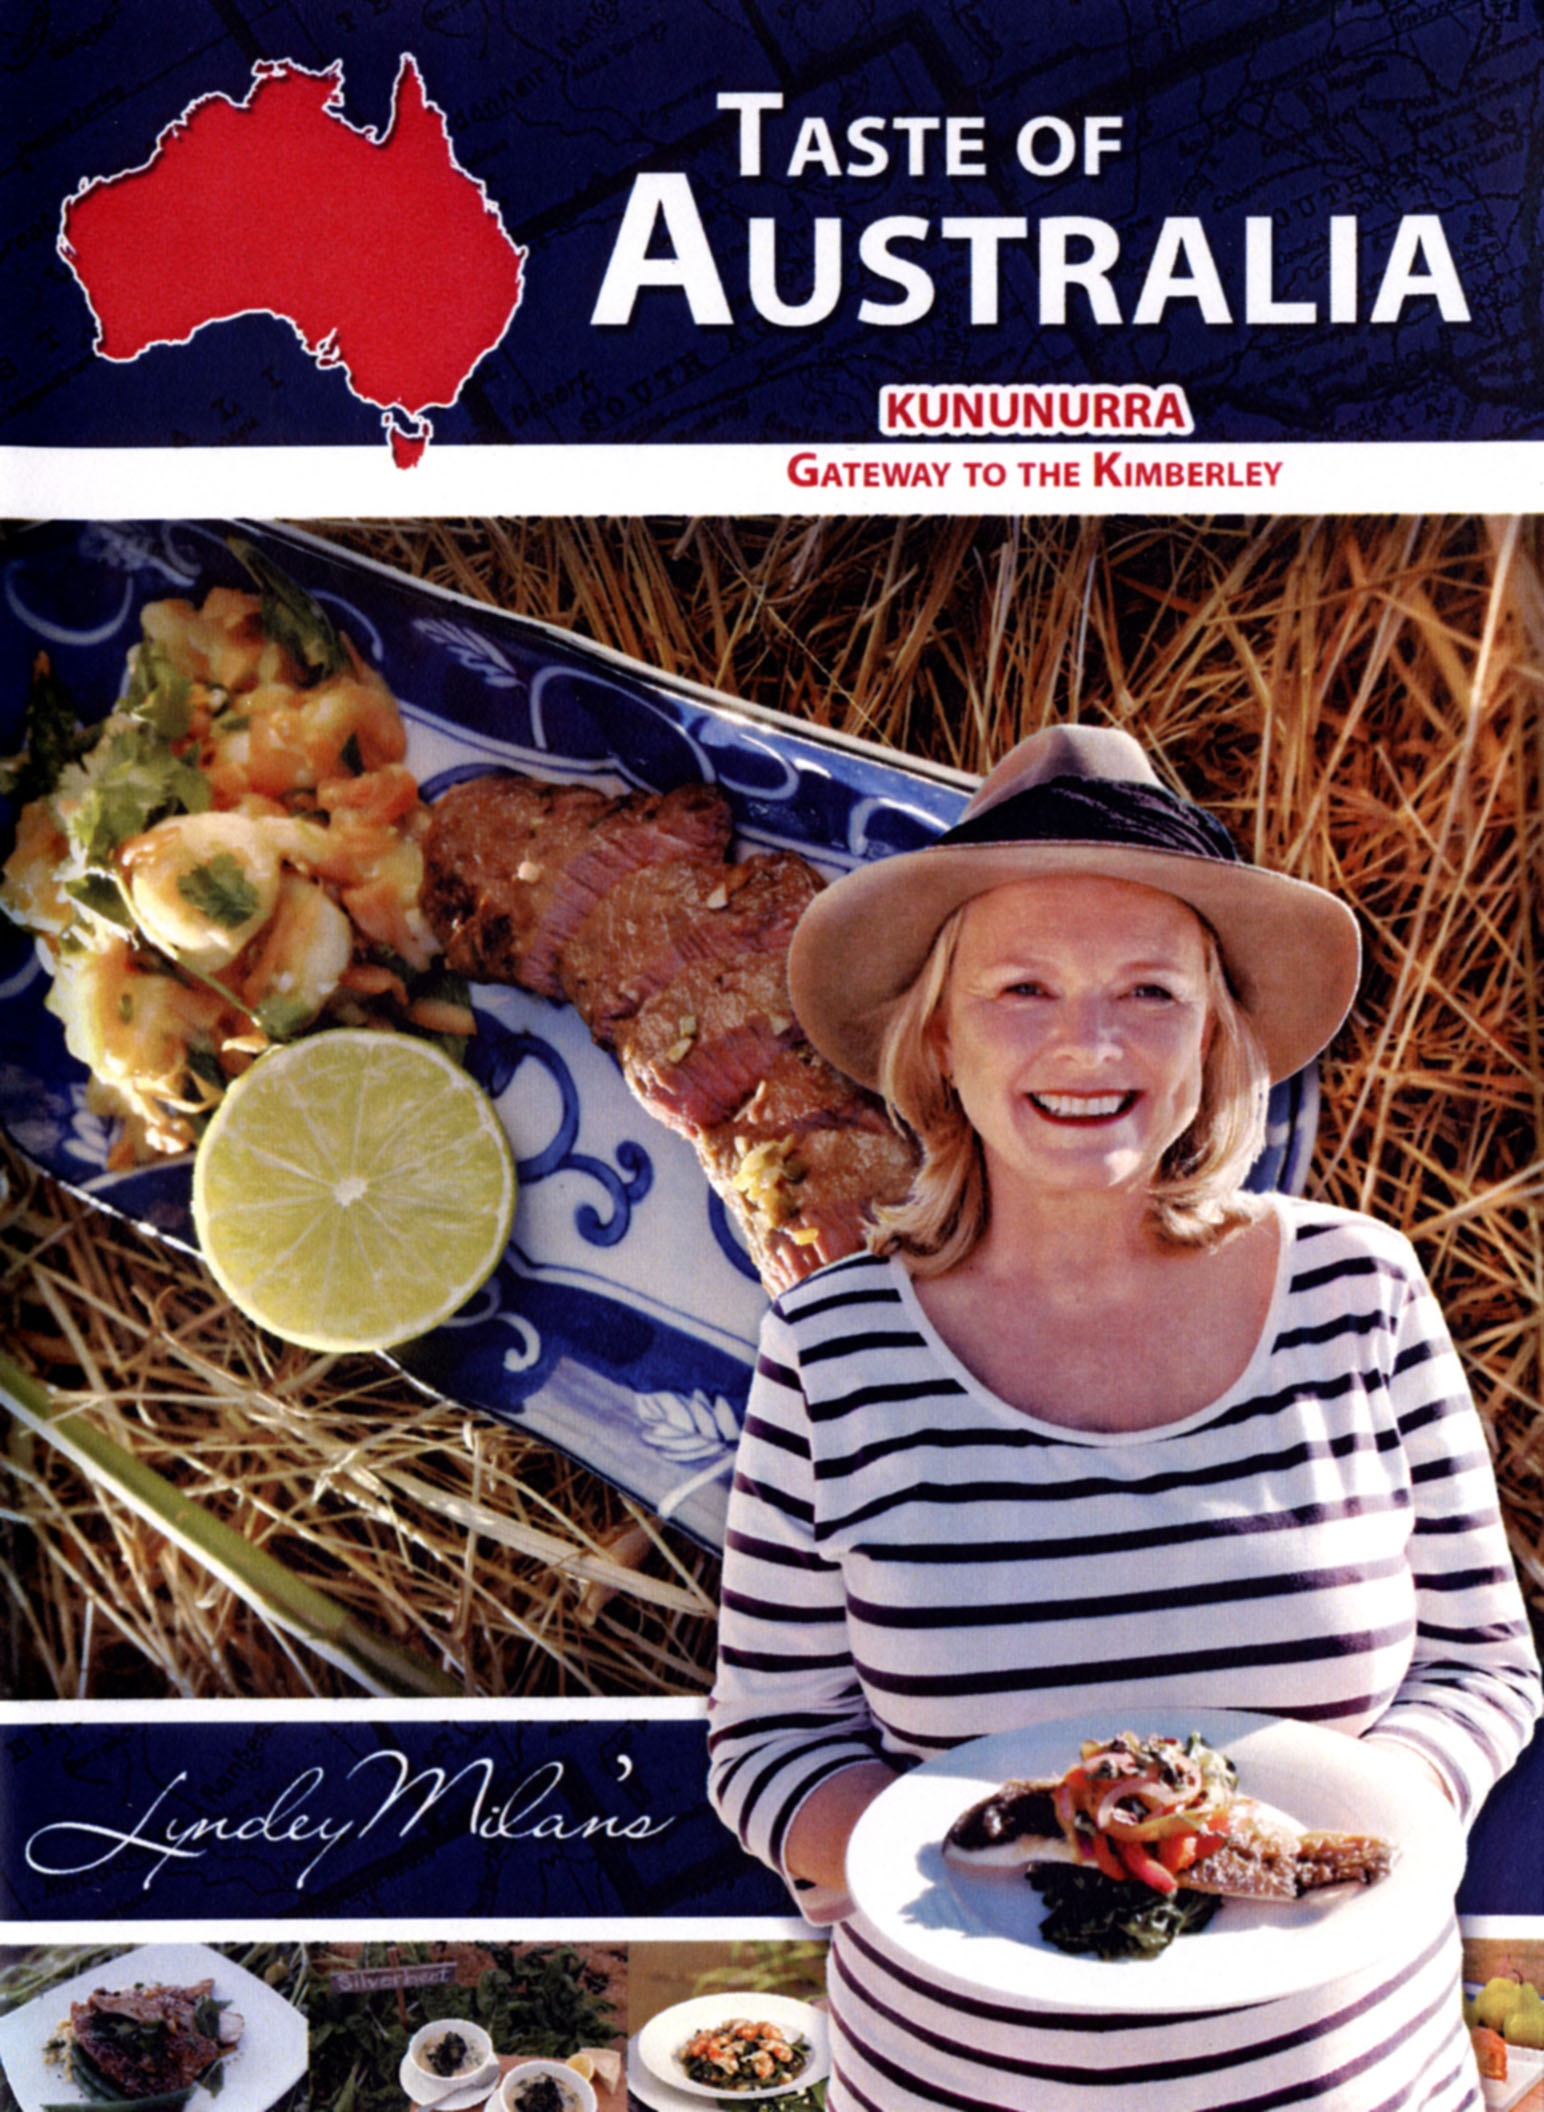 Taste of Australia: Kununurra - Gateway to the Kimberley